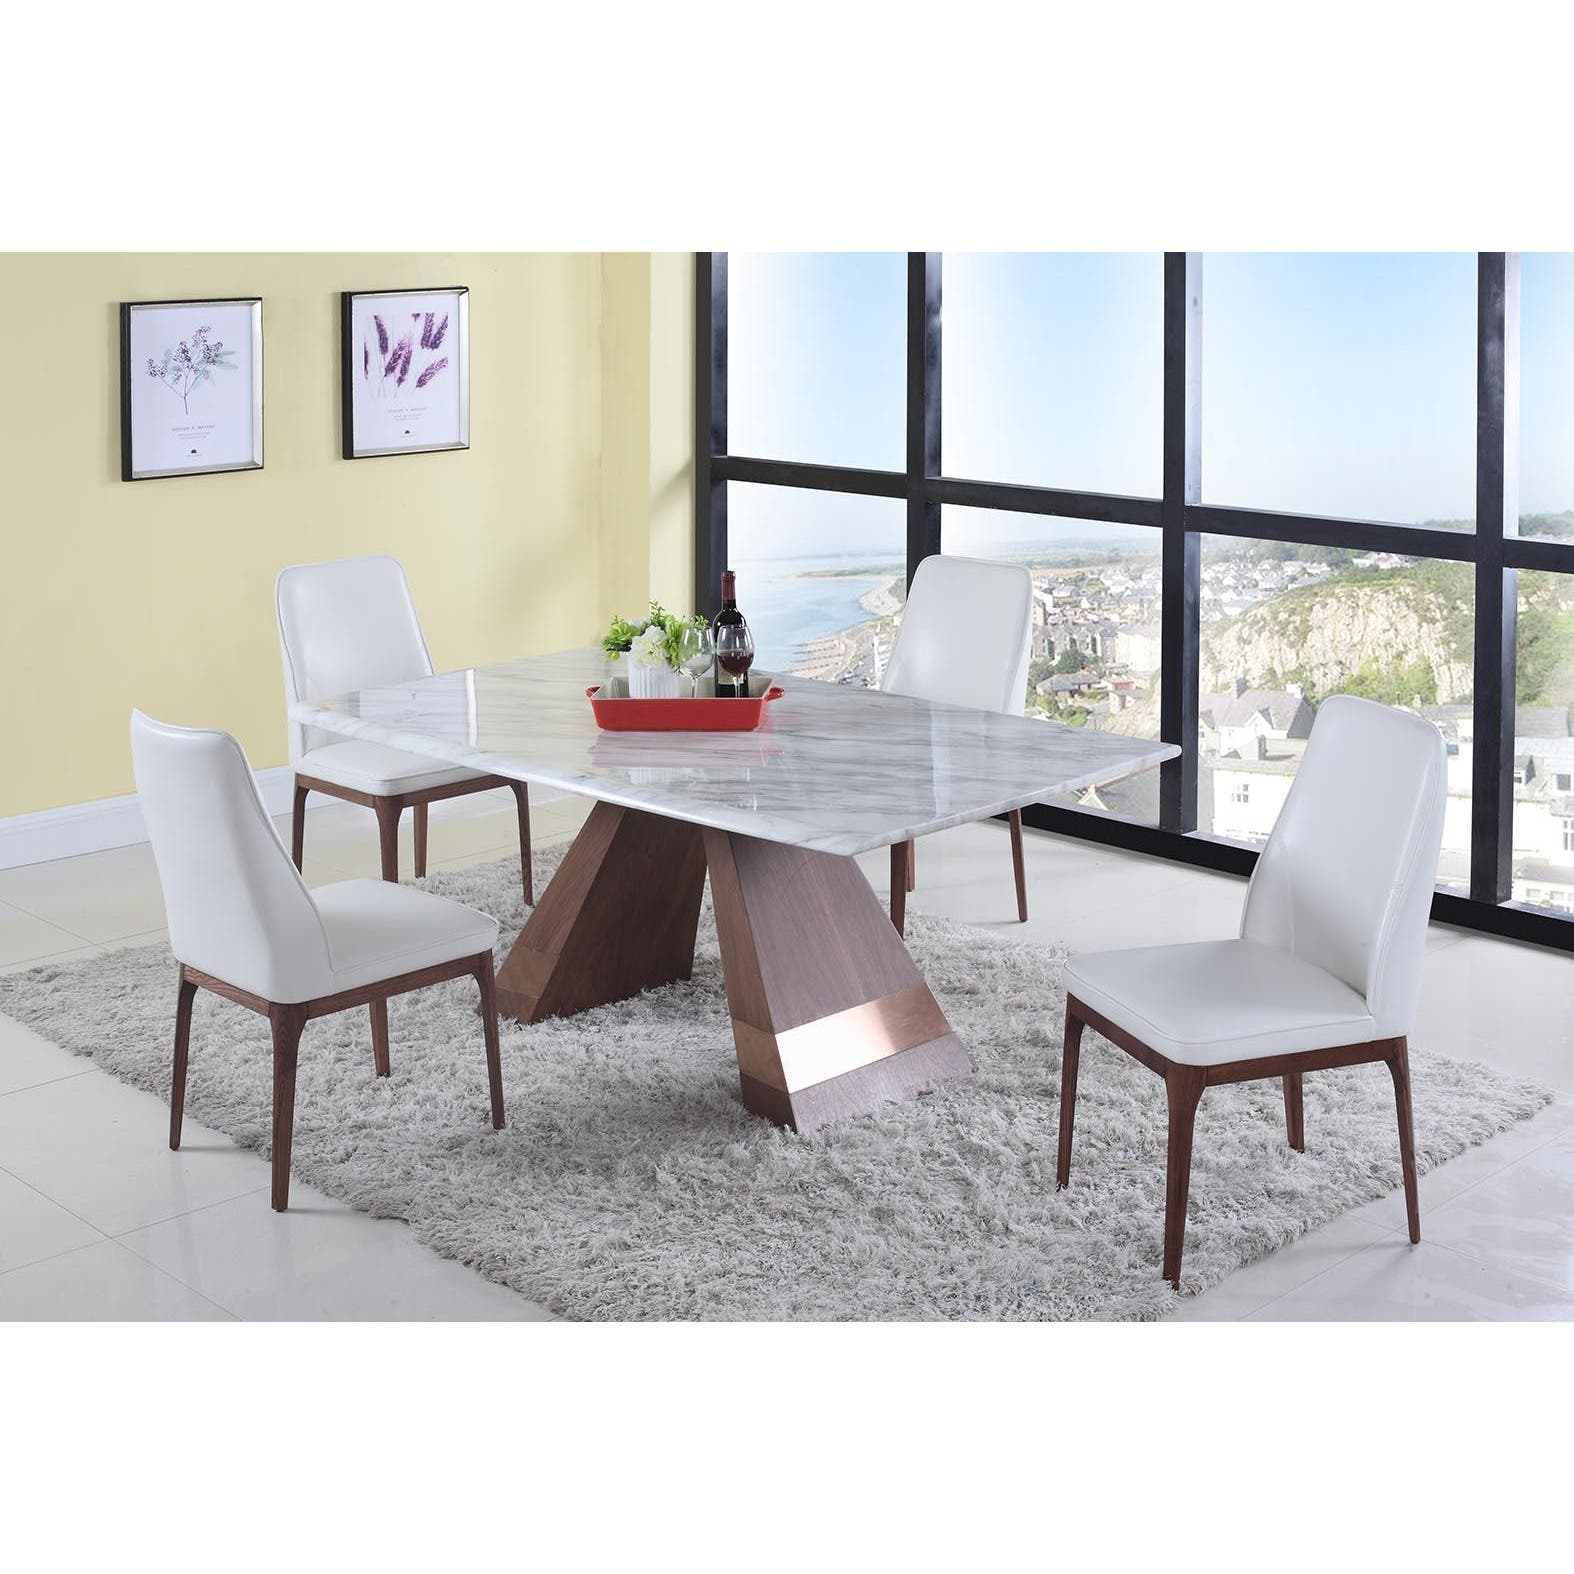 Buy Kitchen & Dining Room Sets Online At Overstock